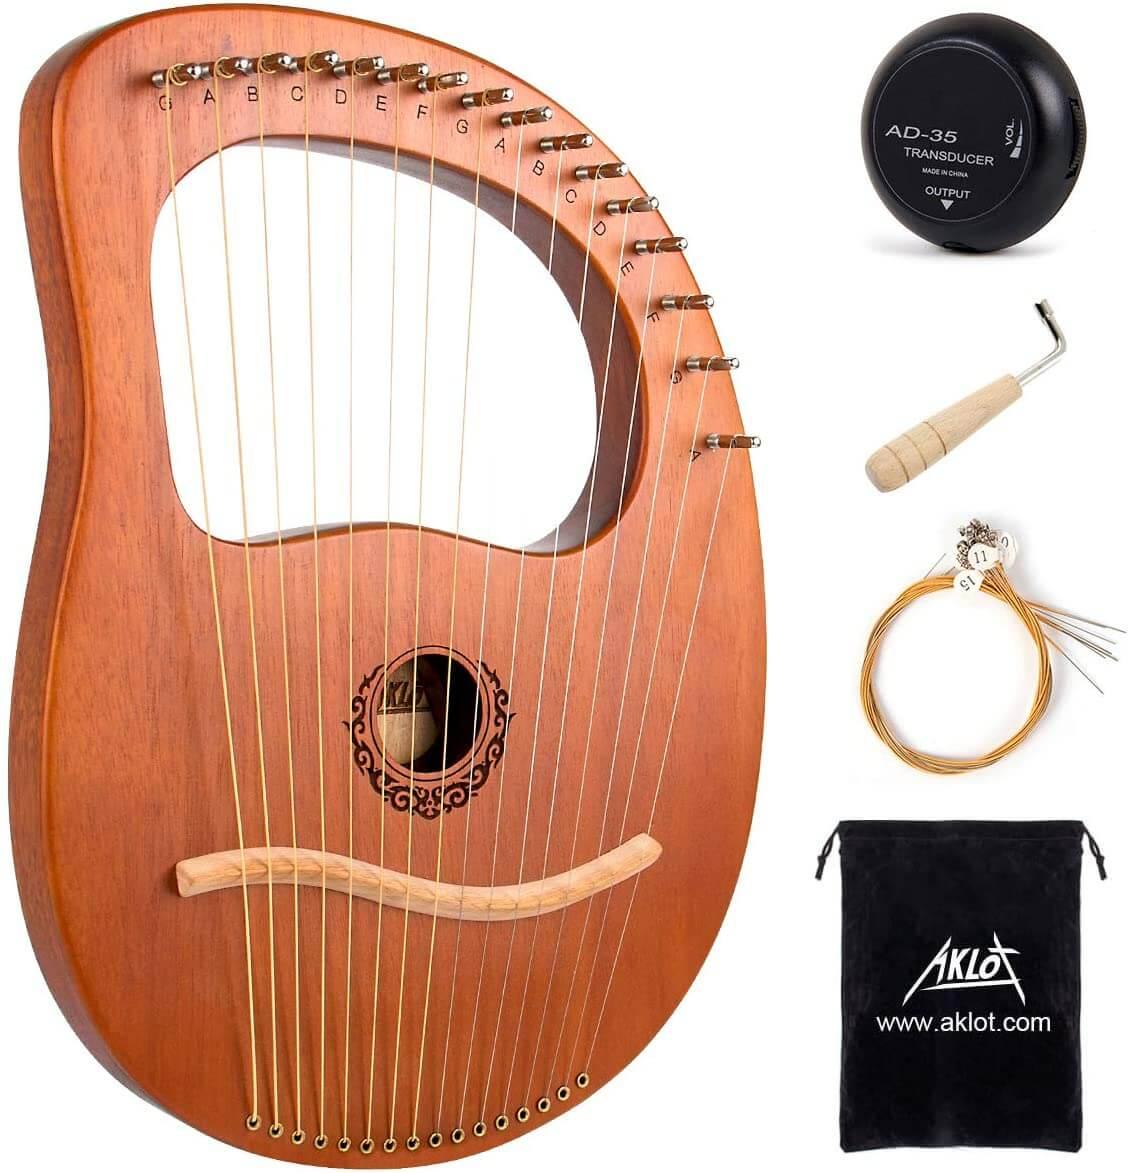 lira strumento Aklot